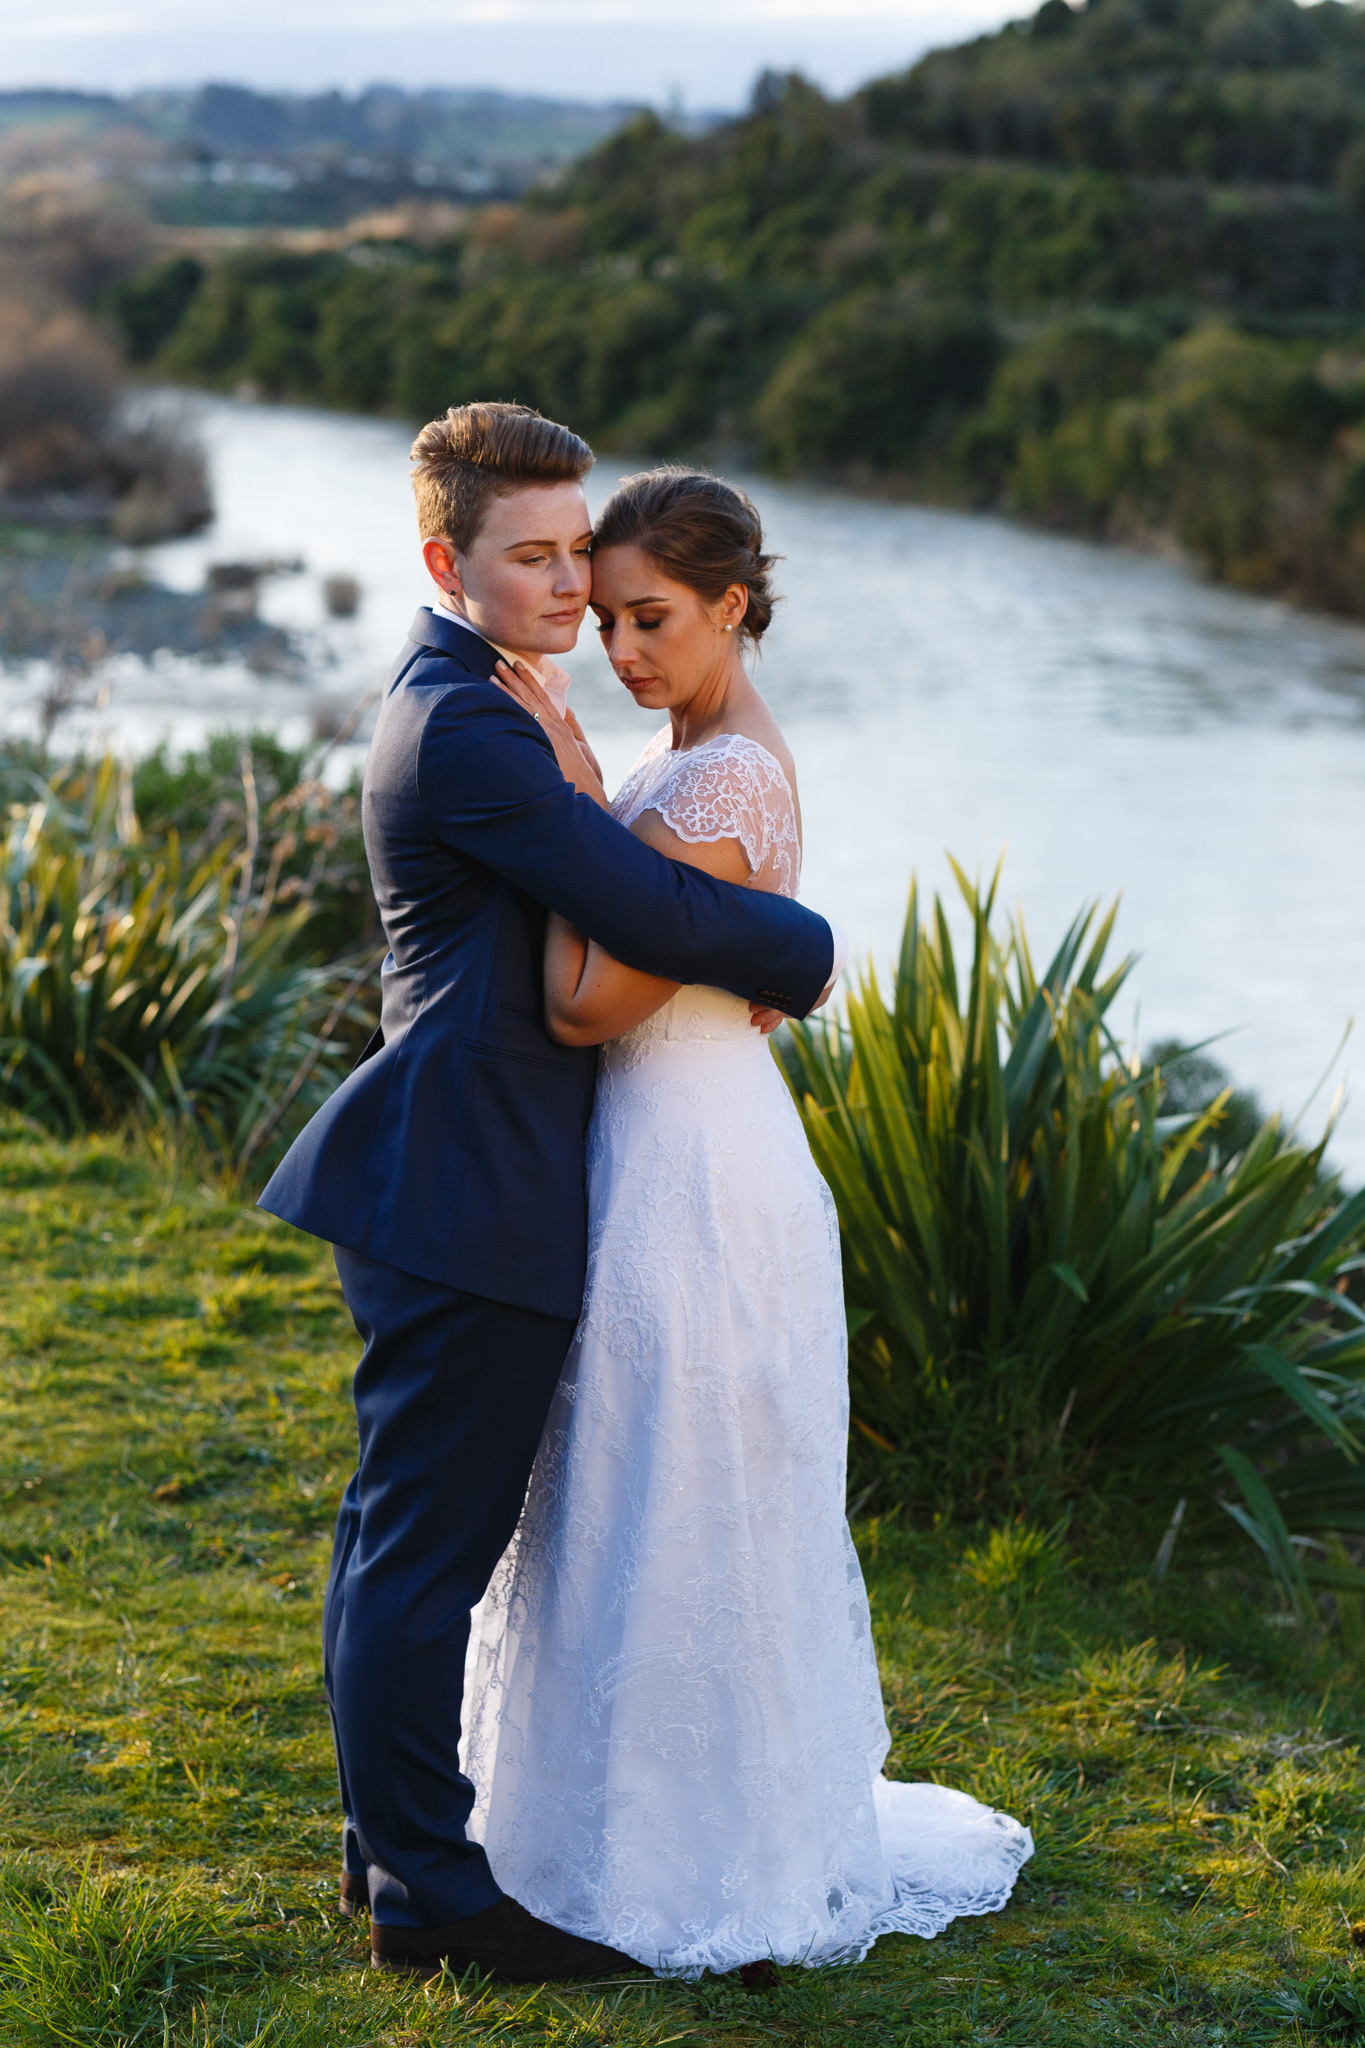 palmerston-north-wedding-photography-highlight-new-zealand.jpg-547.jpg